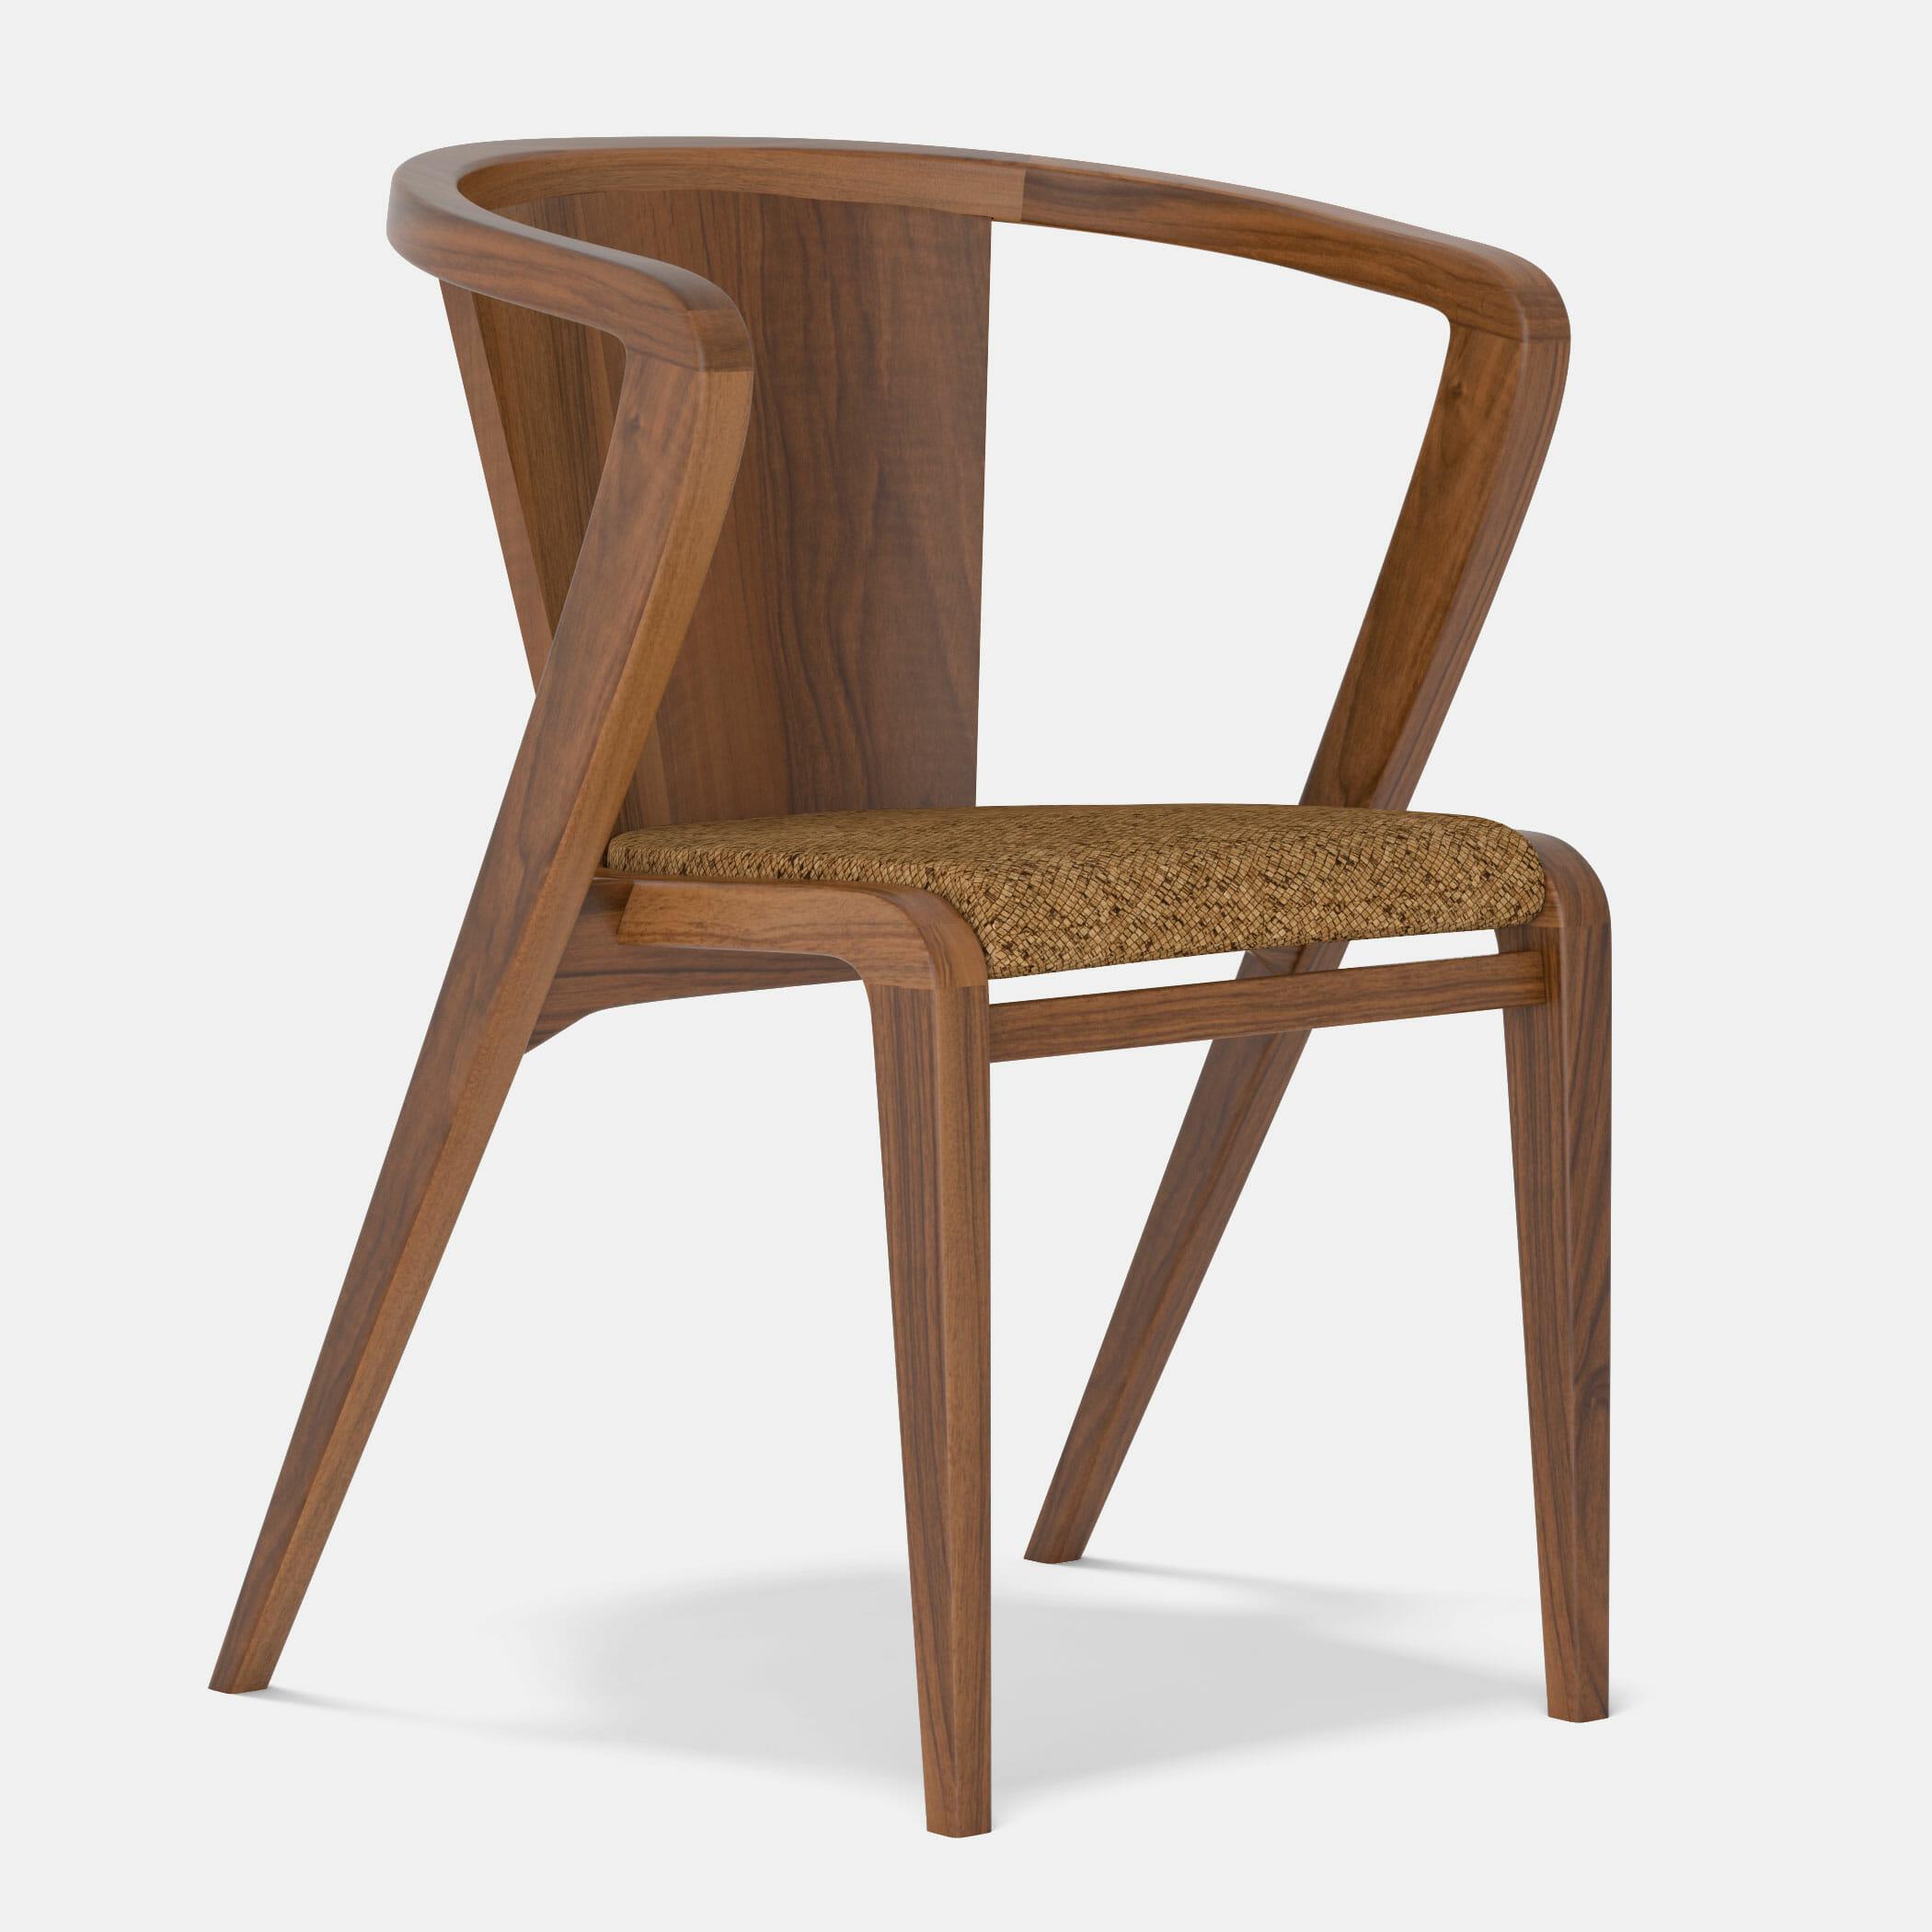 34-Roots-Nogueira-Estofo-Assento